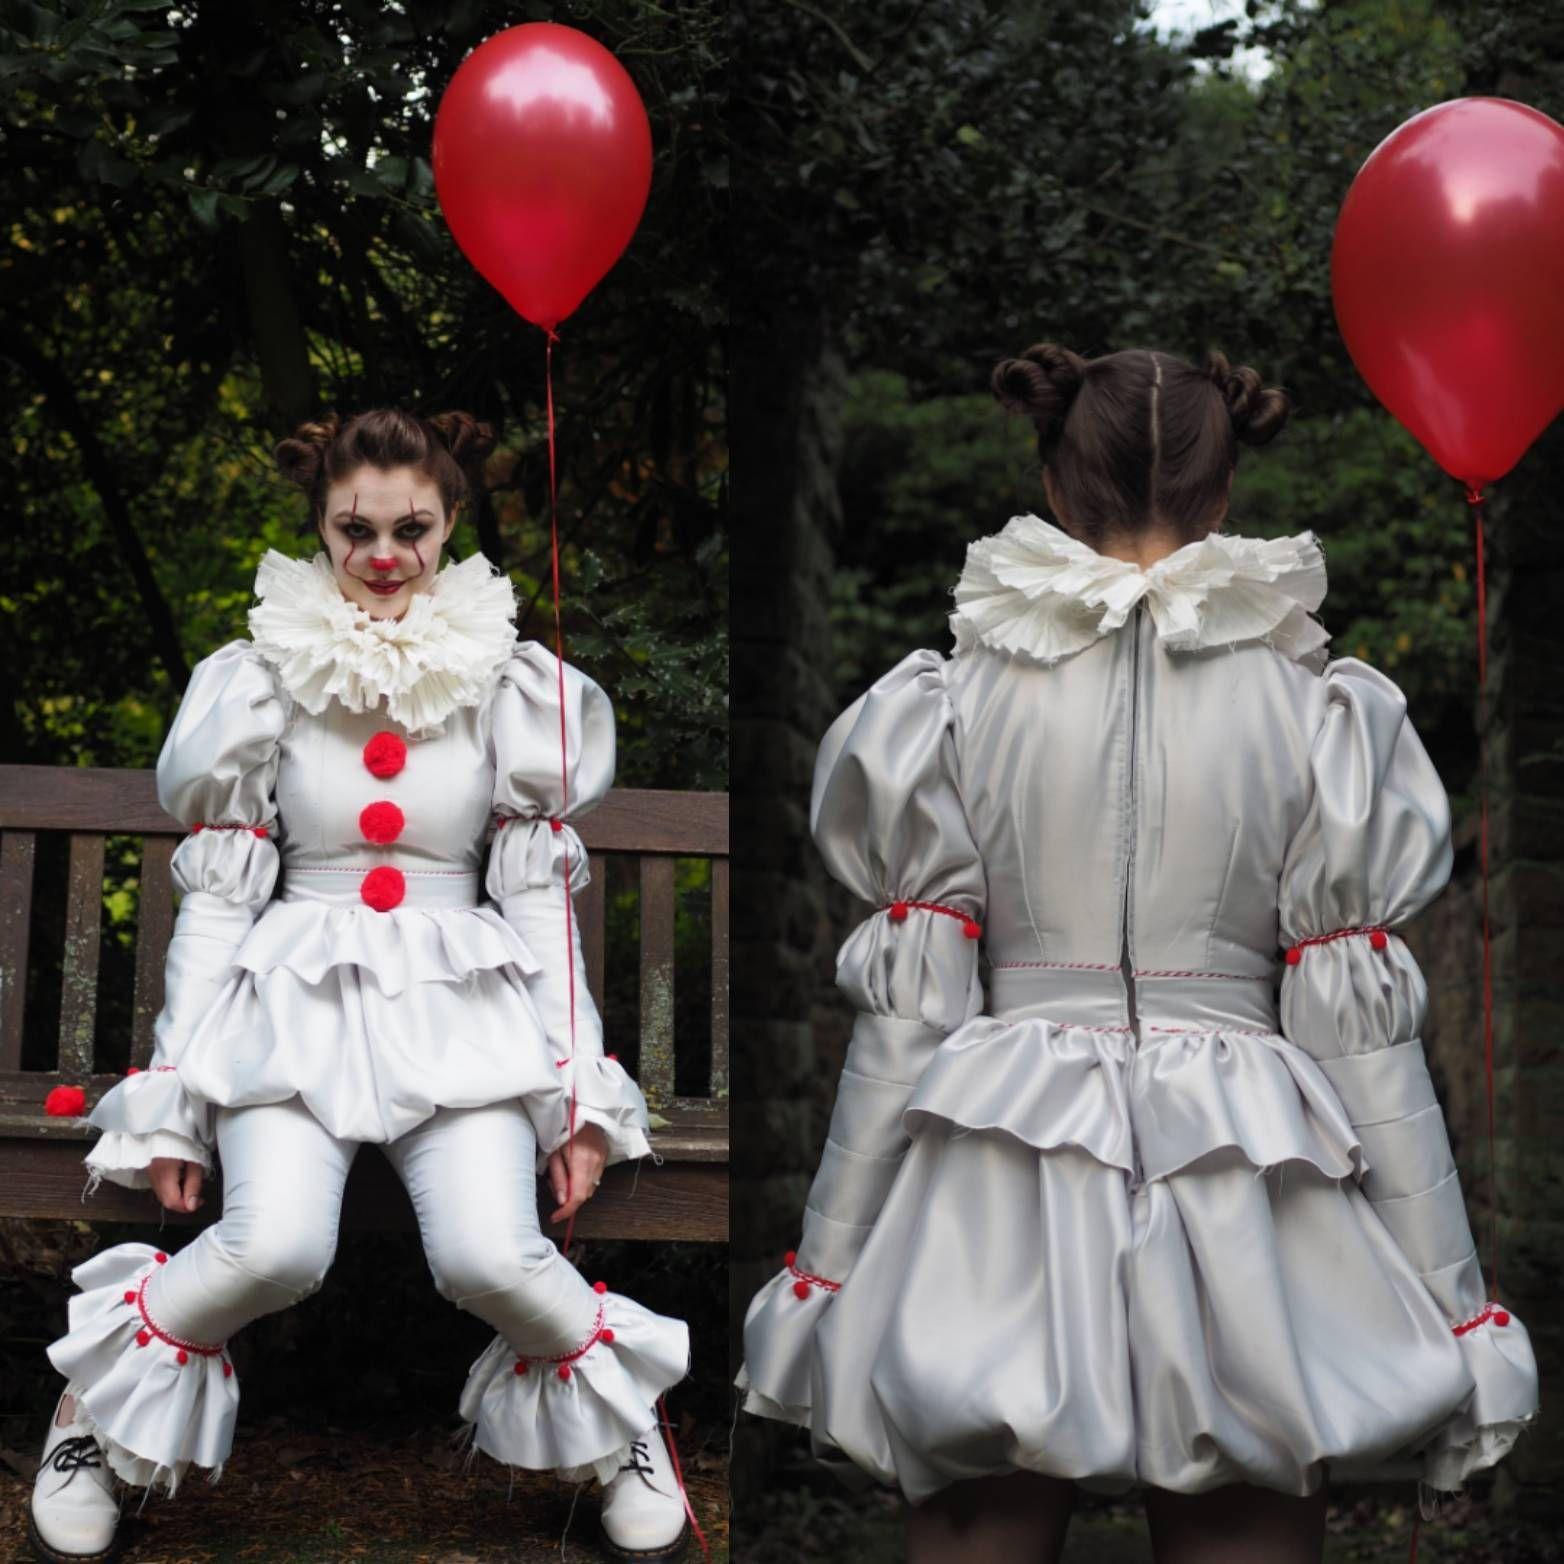 Keptalalat A Kovetkezore Pennywise Clown Costume Pattern